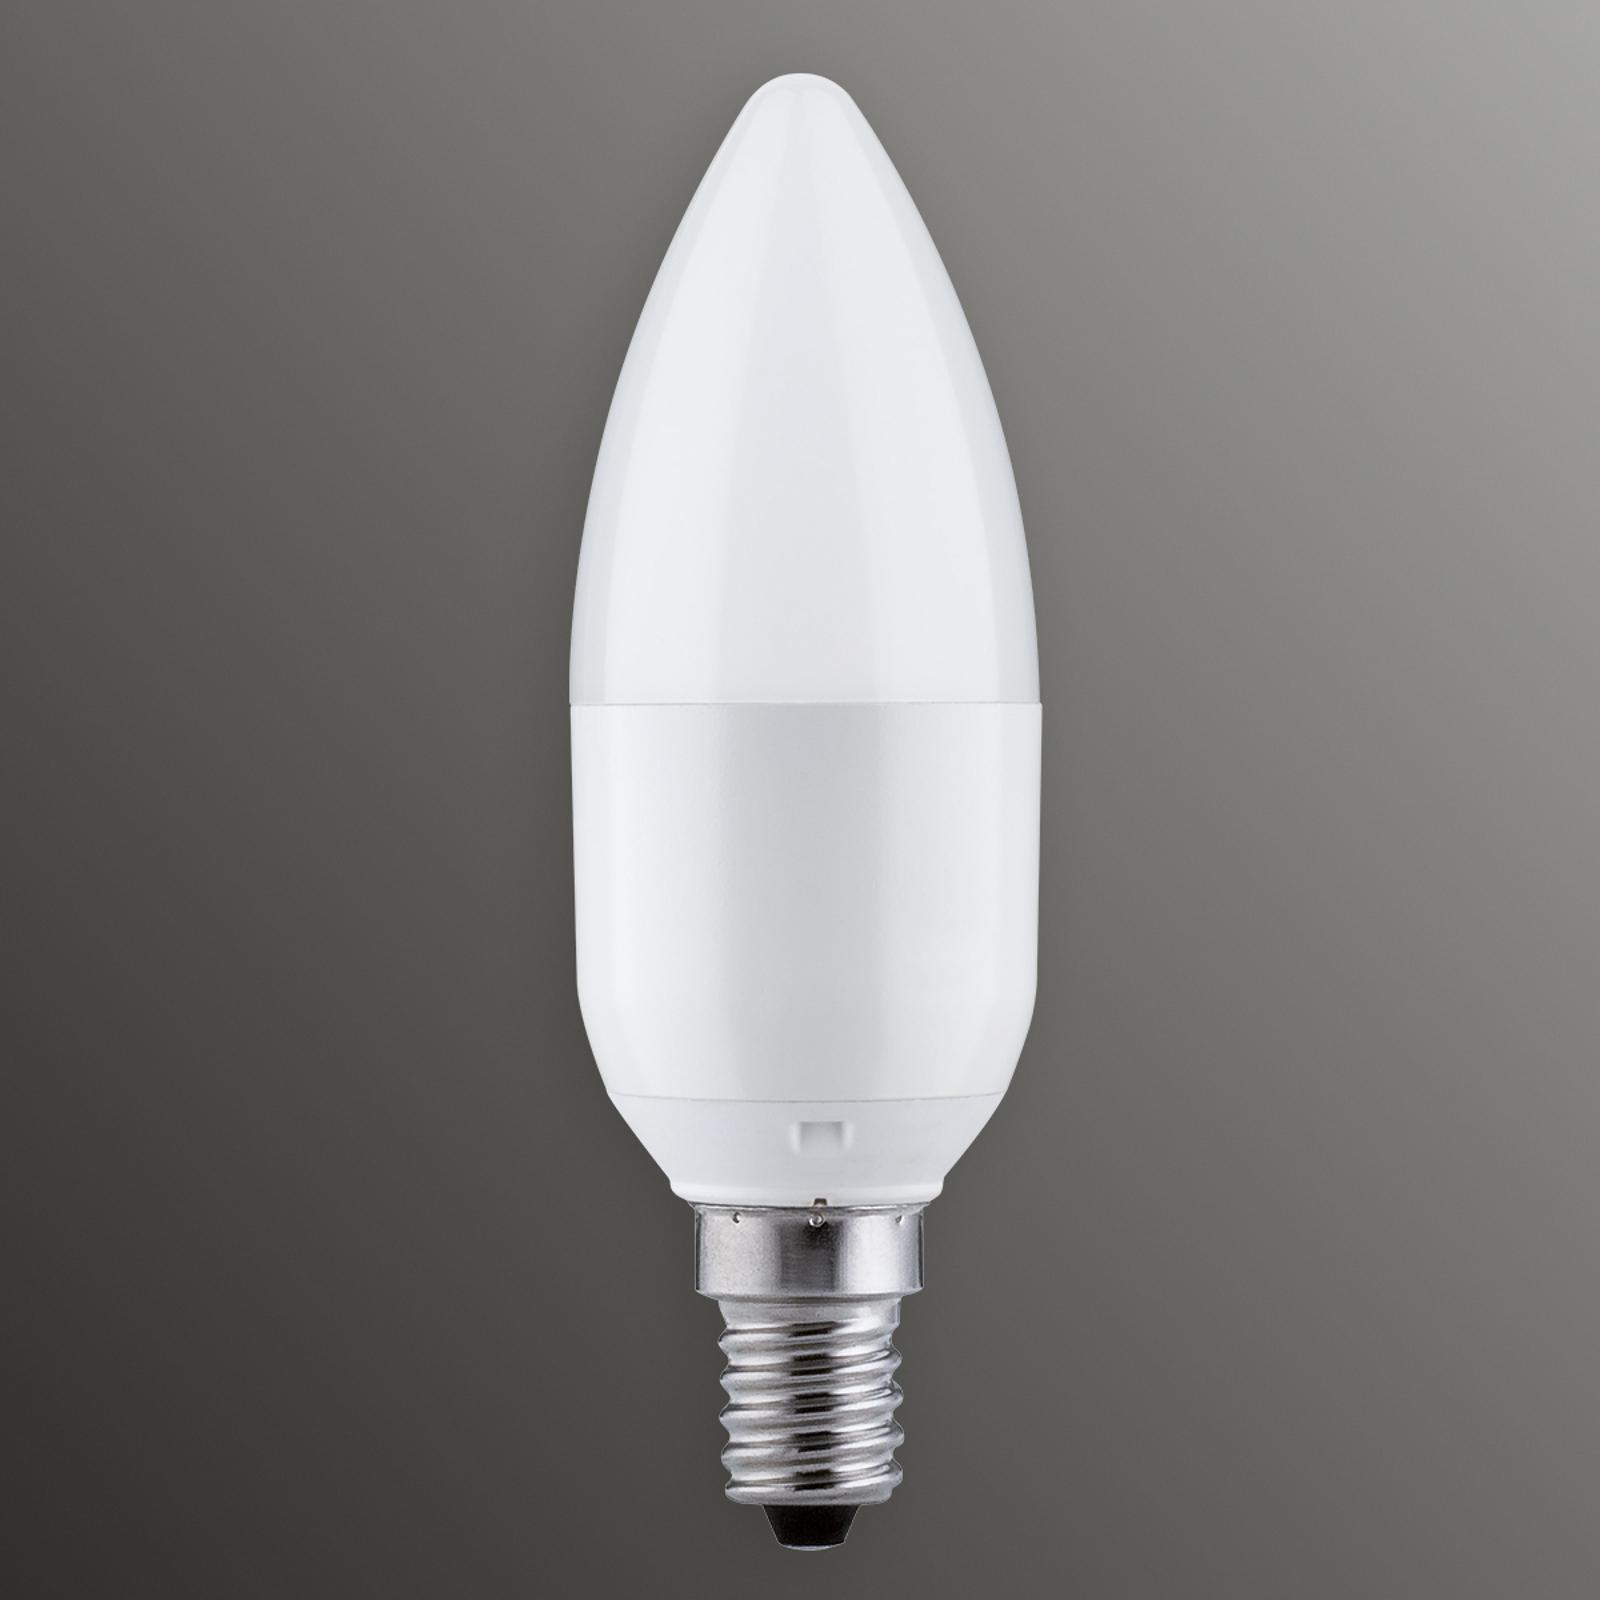 Paulmann LED-Kerzenlampe E14 5,5W 827, dimmbar